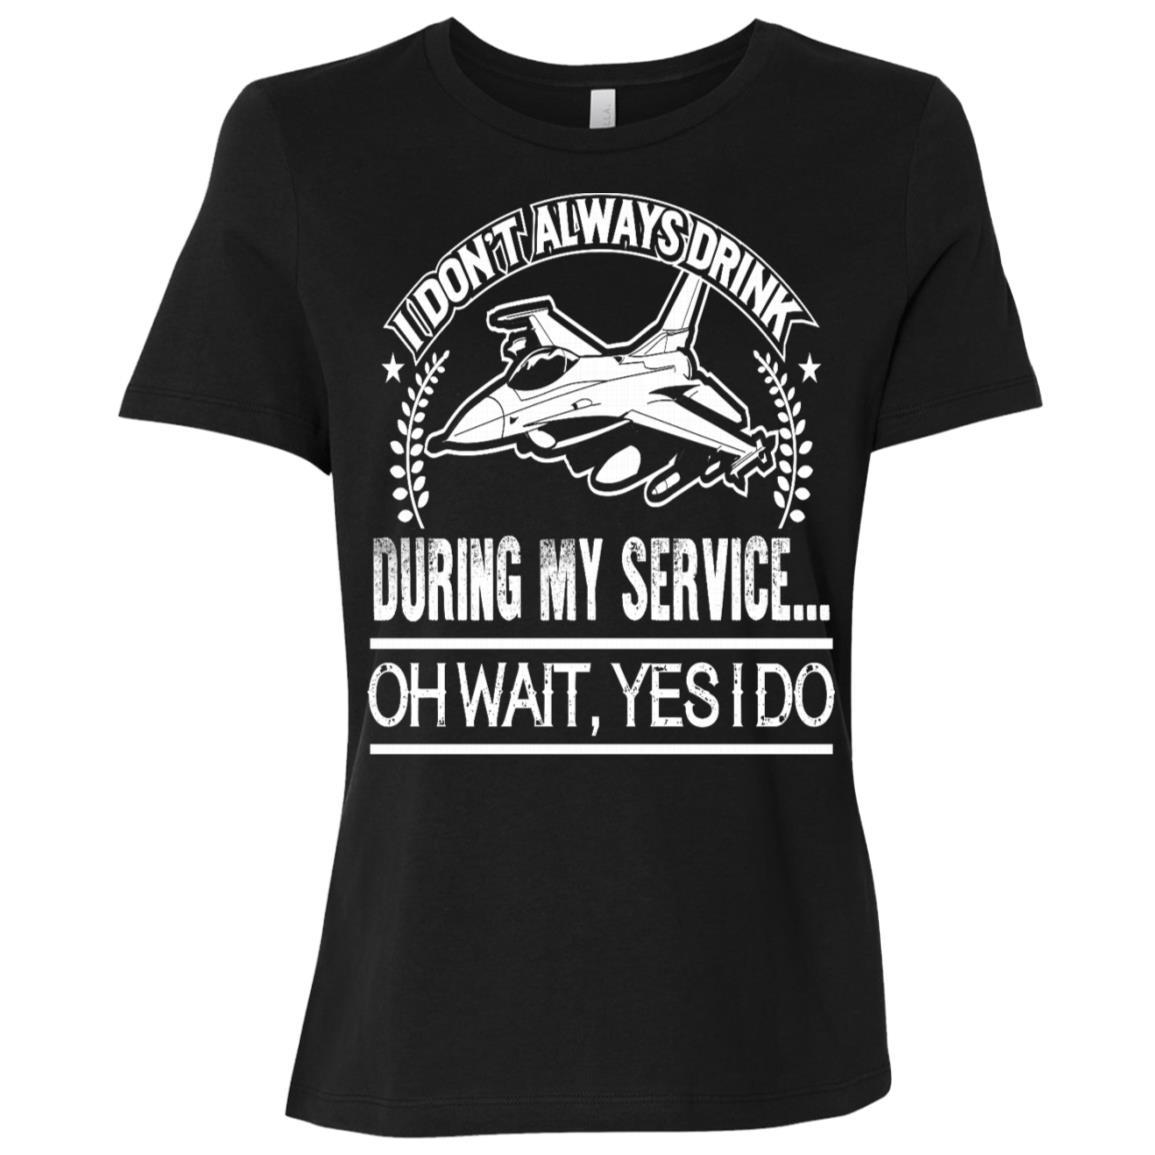 U.s. Air Force – During my service… – Women Short Sleeve T-Shirt